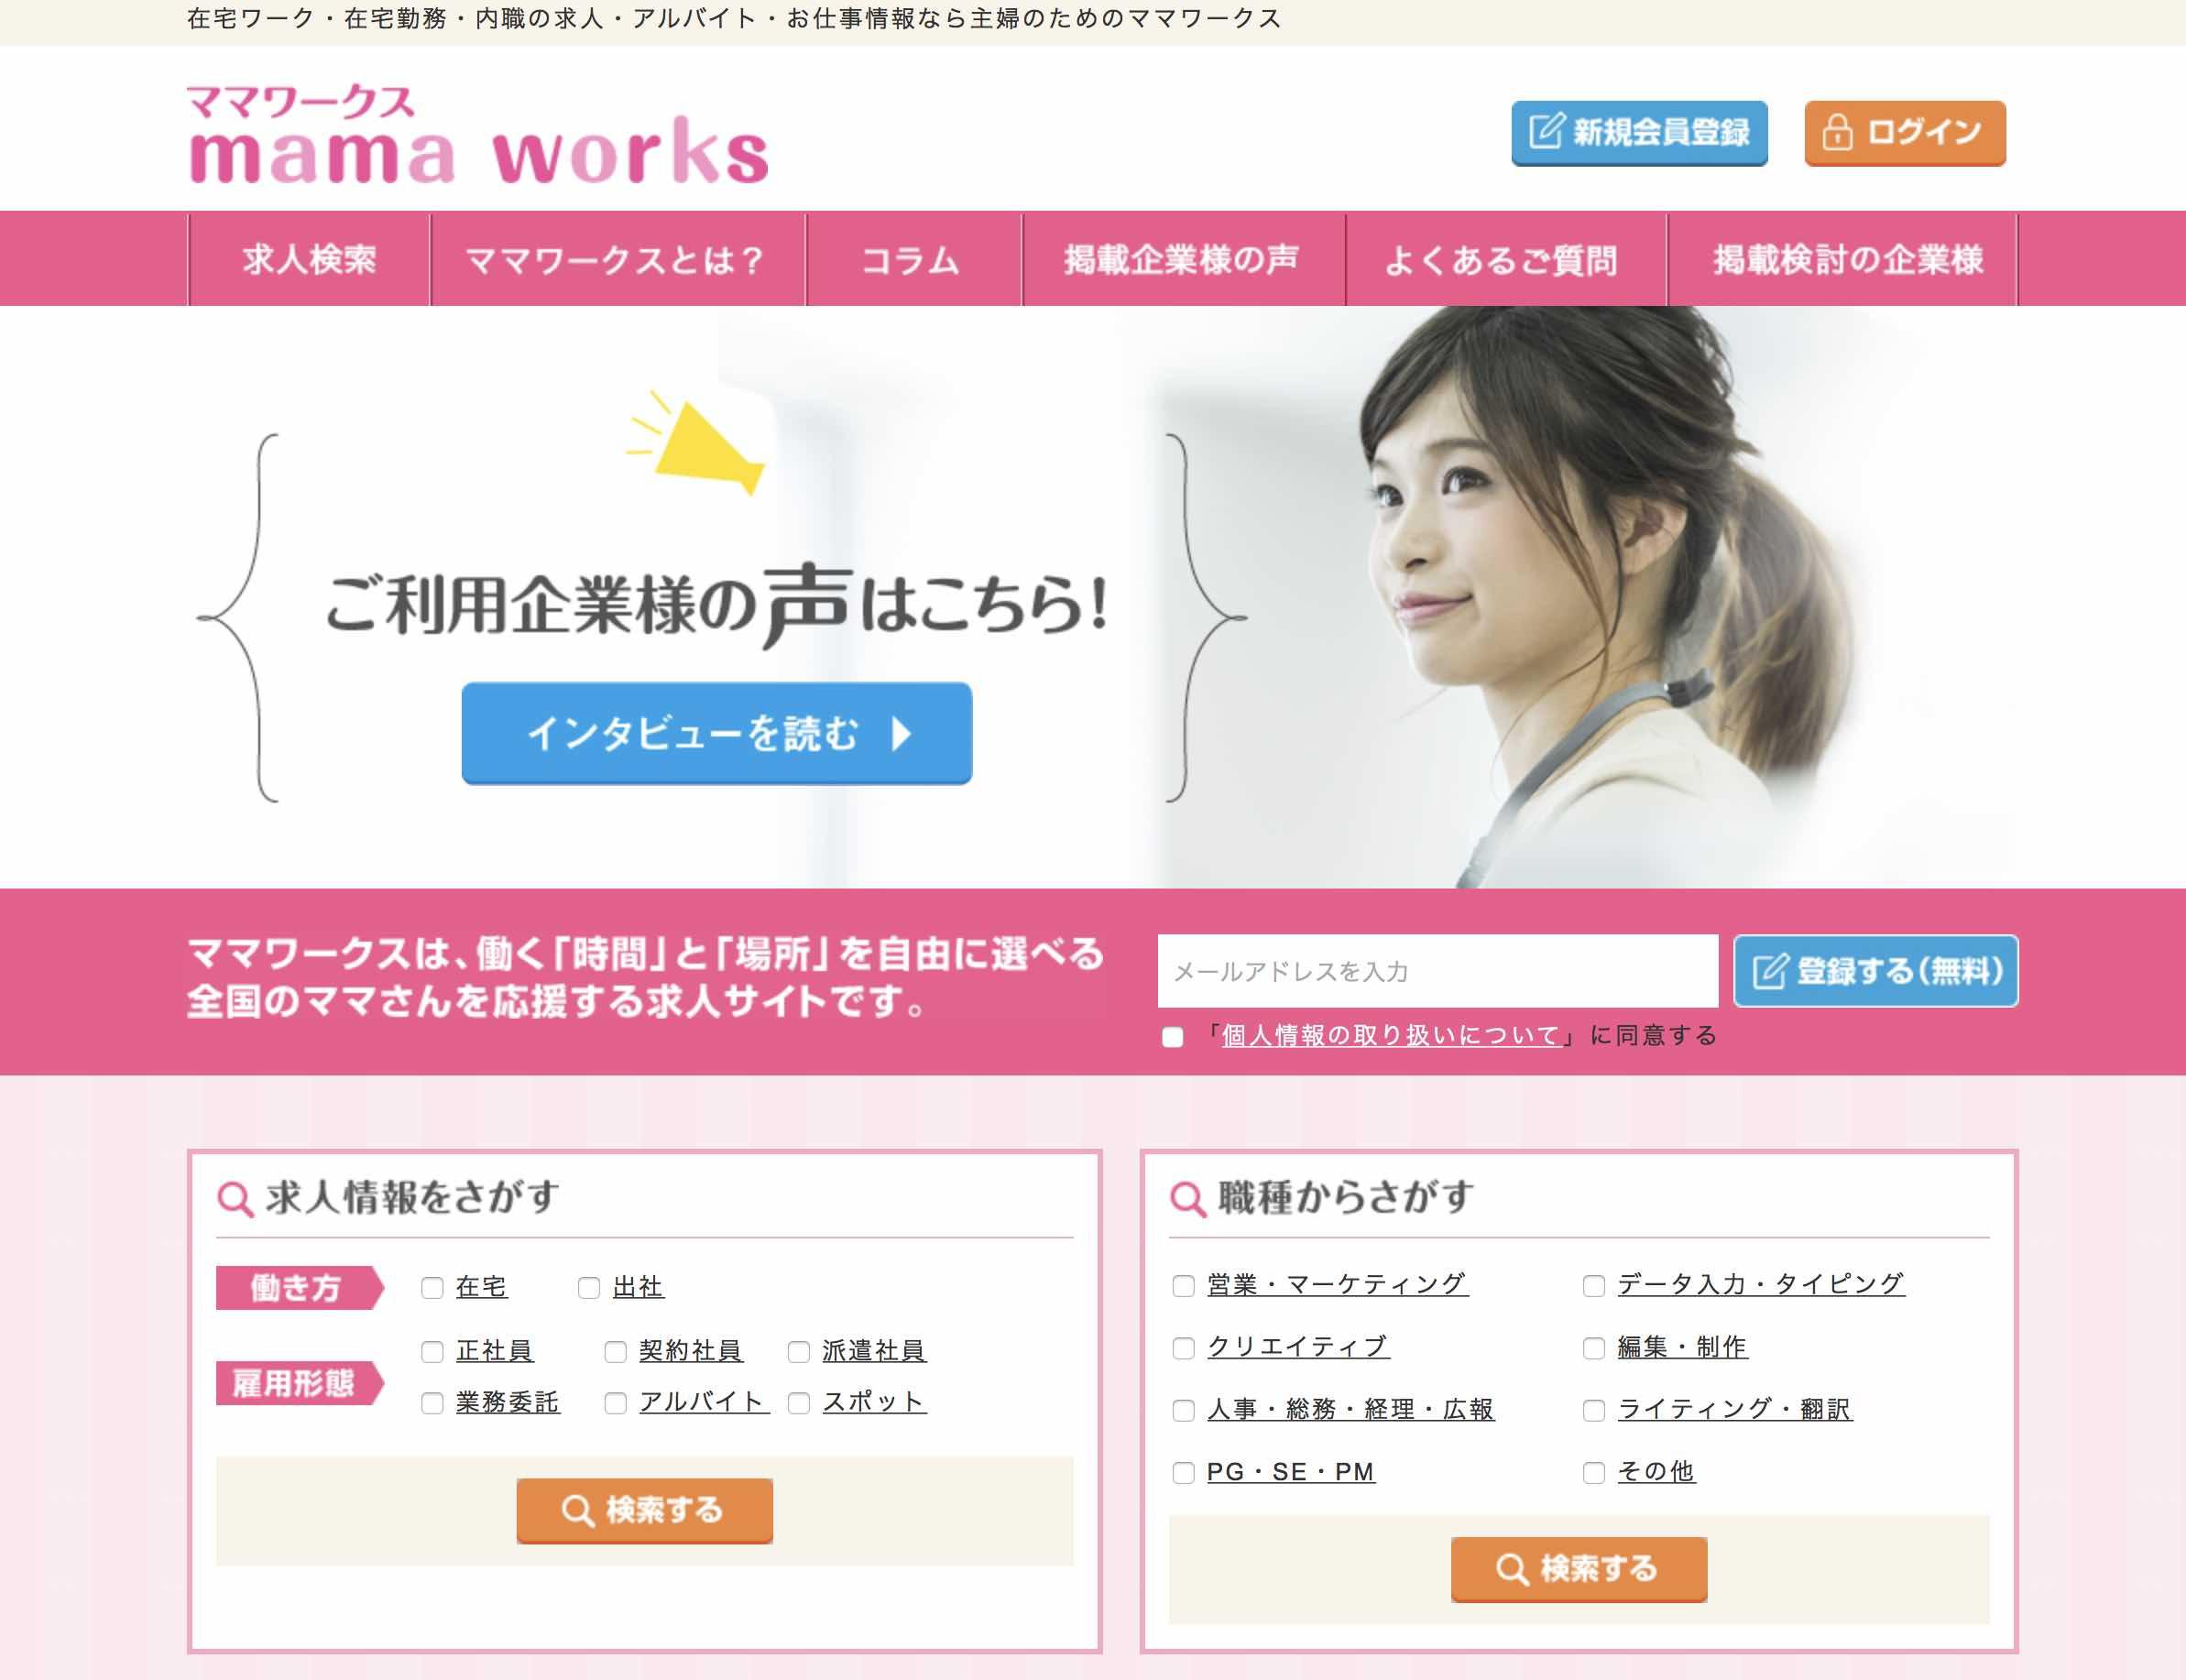 mama works(ママワークス)